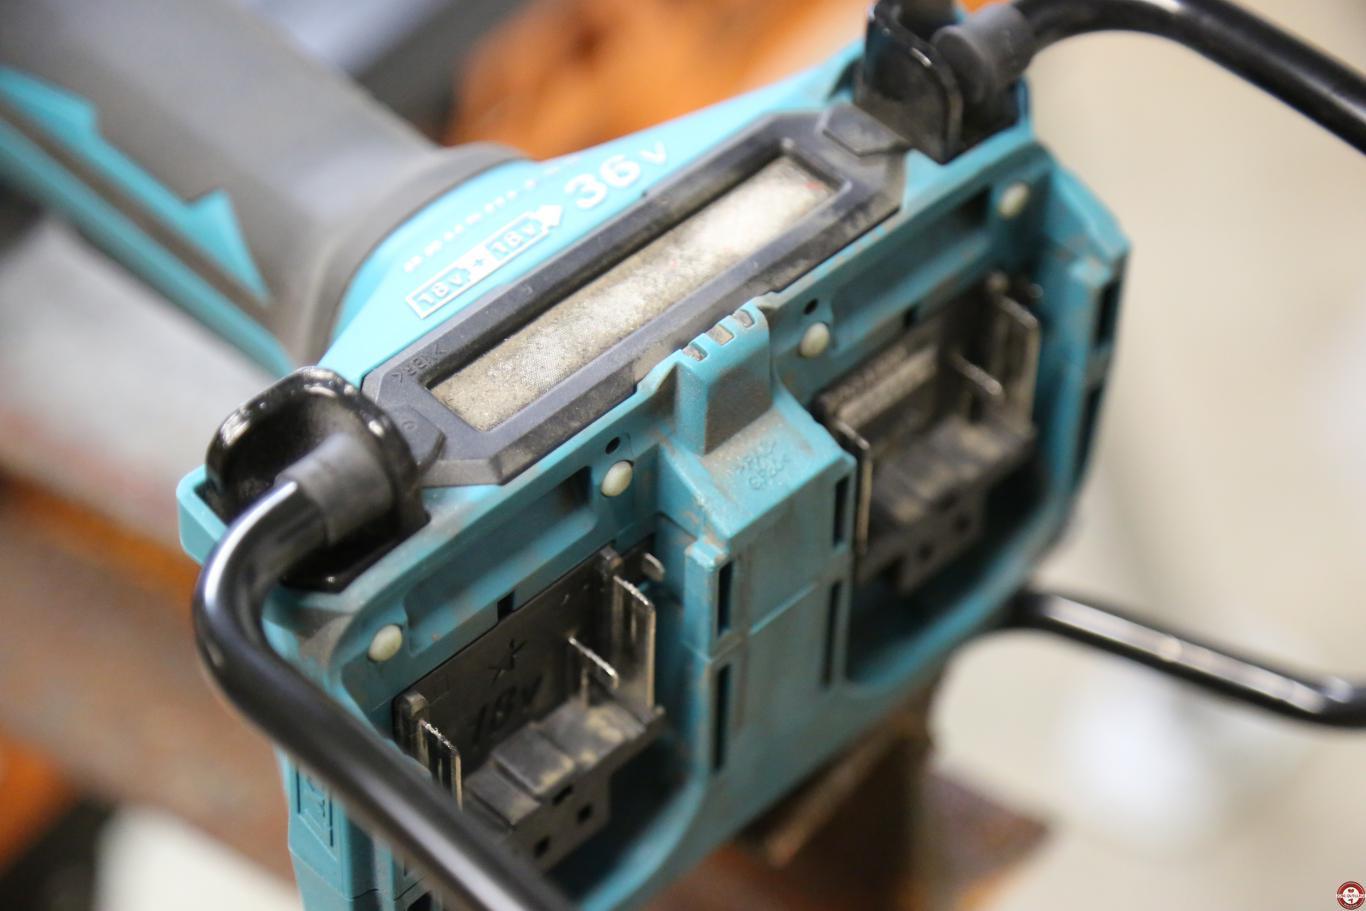 Test de la meuleuse DGA900 Makita 230 mm